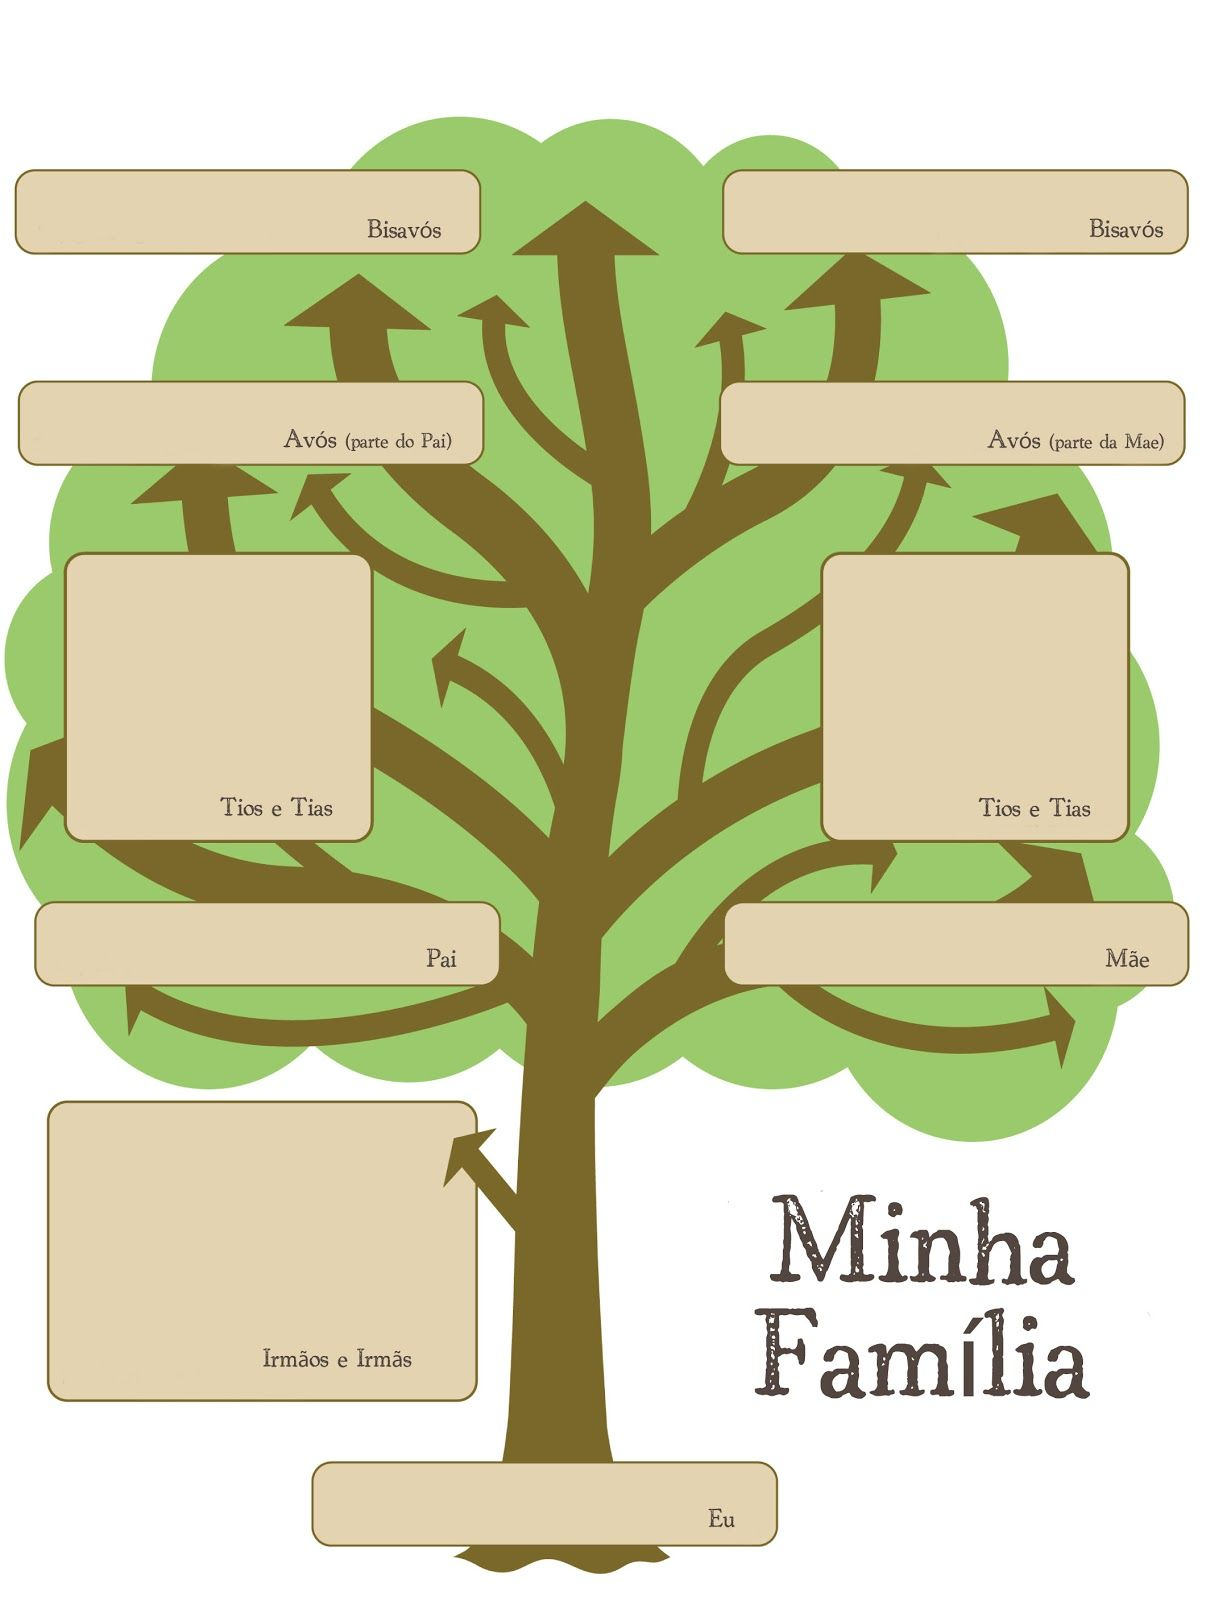 Bring An Ancestor To Activity Days Projetos Arvore Genealogica